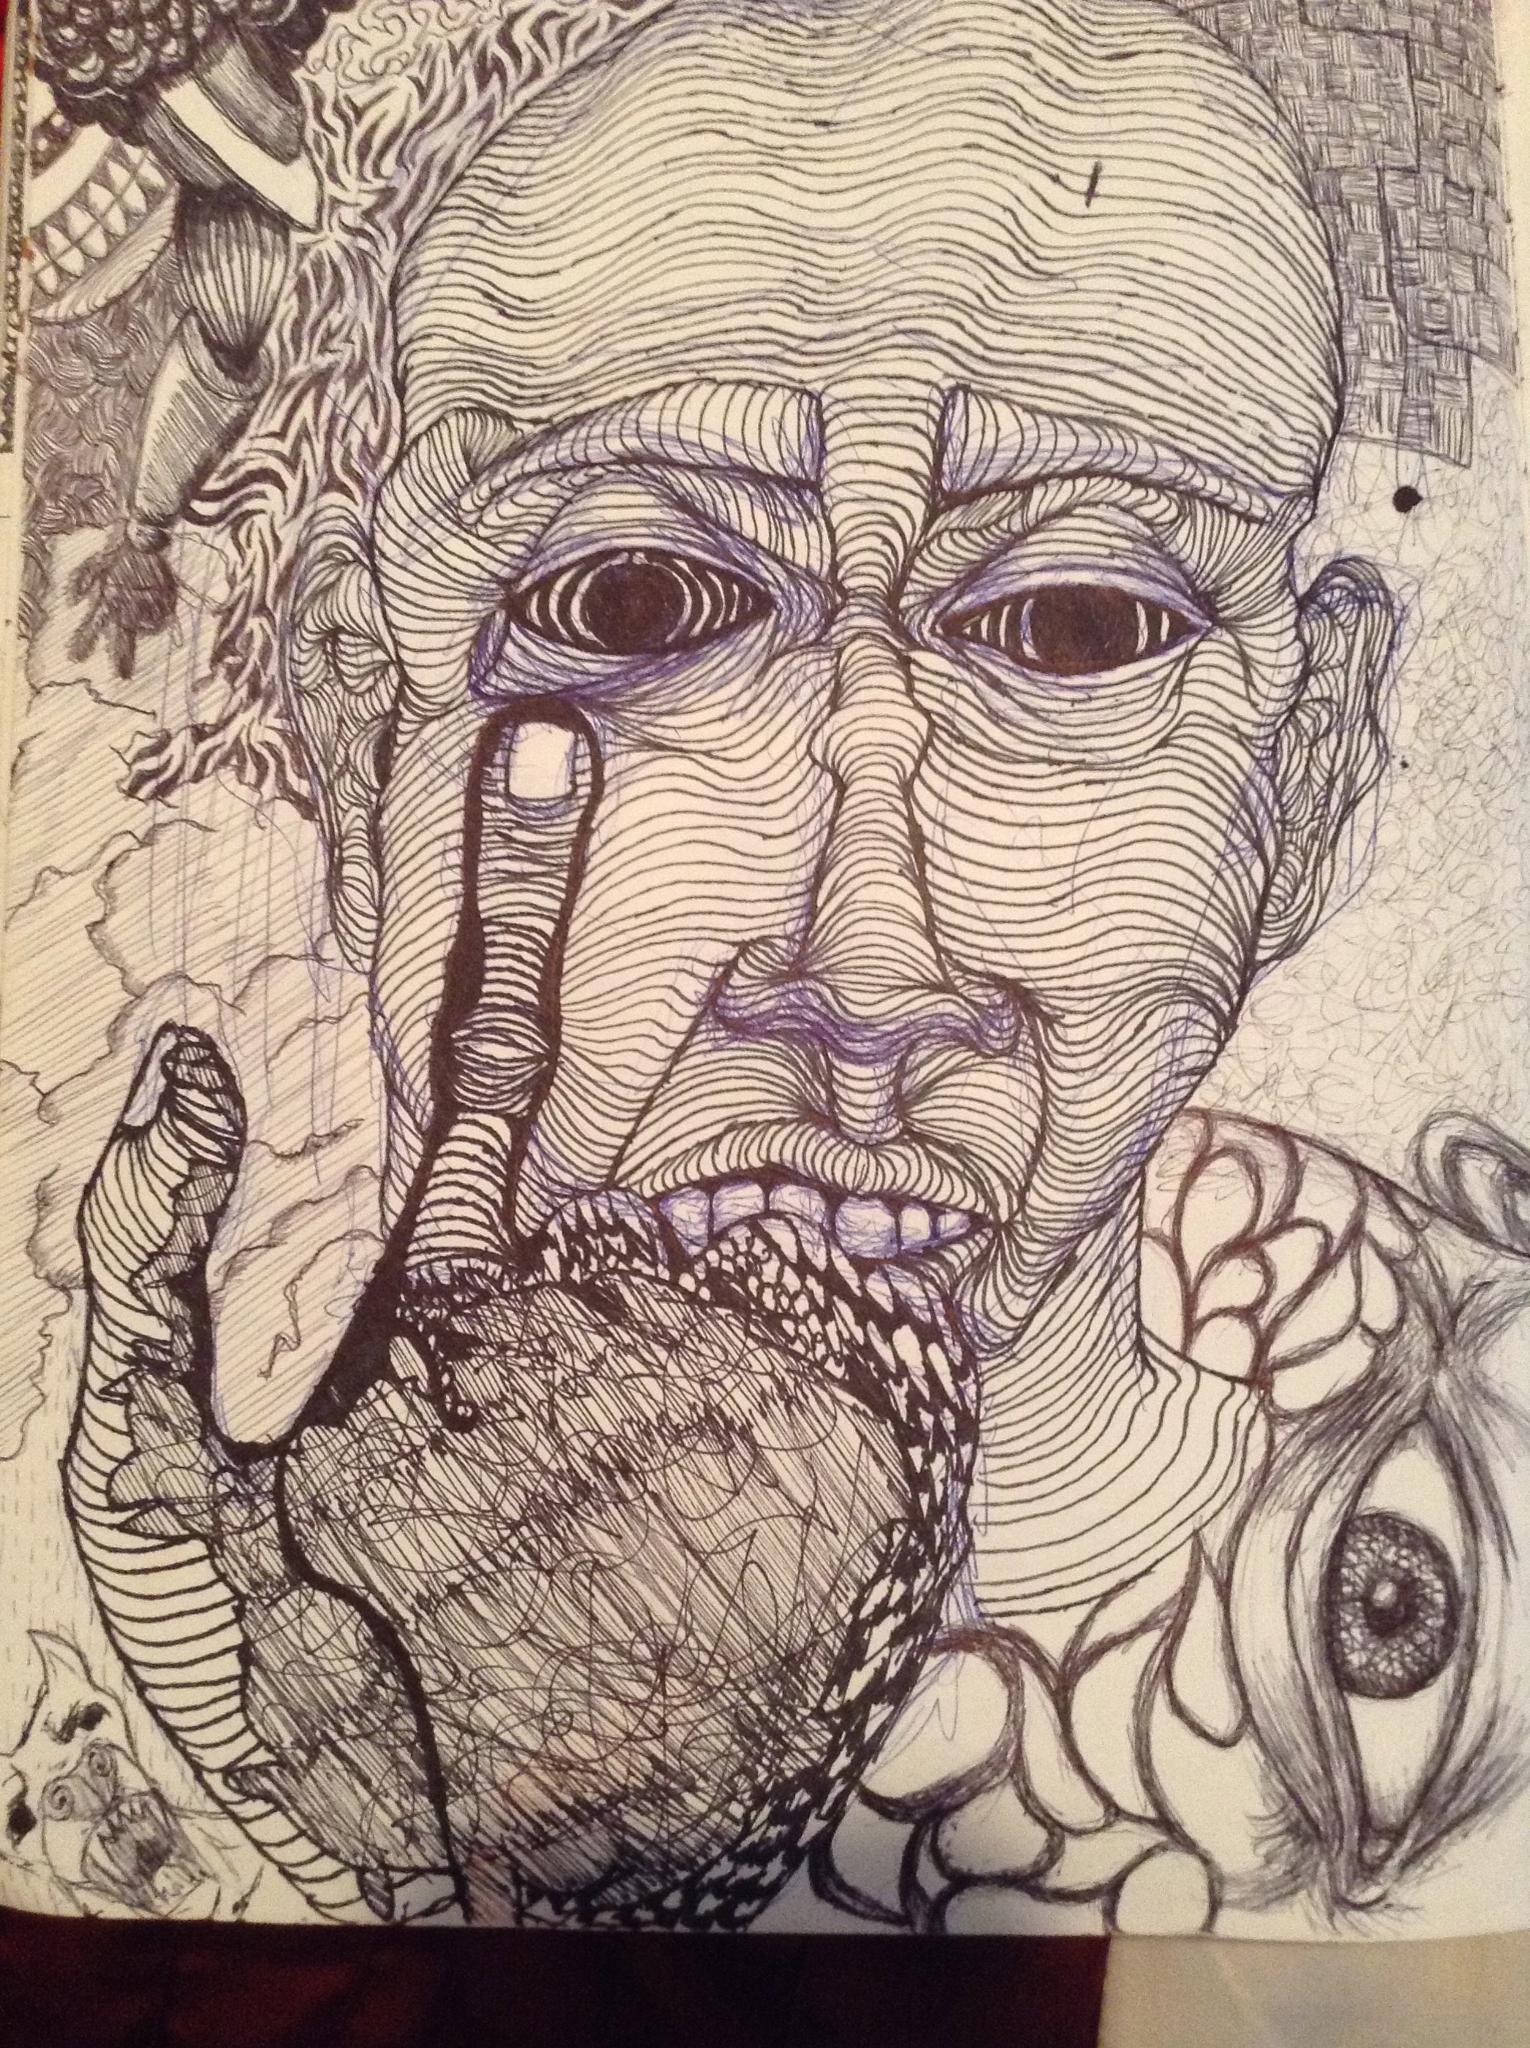 Strange one by Graphic Artist JYJWLZ.COM by Bebet Blue Amazon